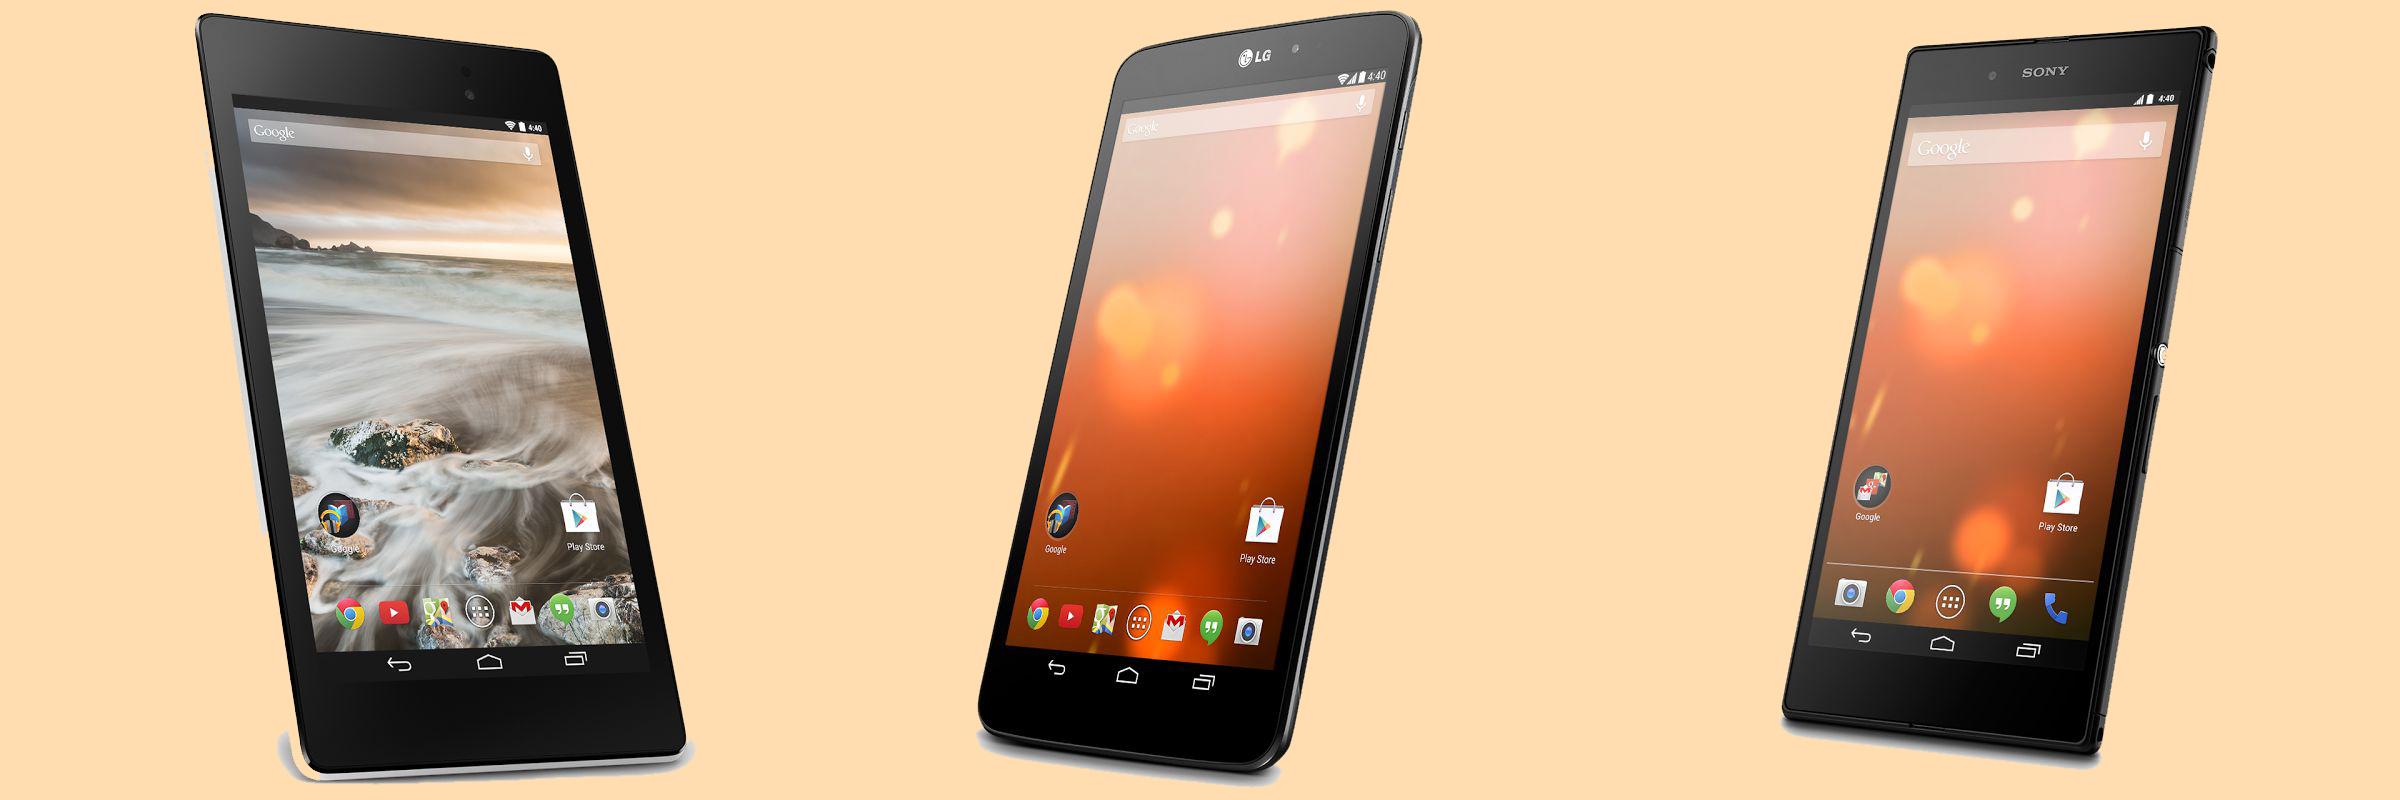 Google представил LG G Pad 8.3, Sony Z Ultra и белый Nexus 7